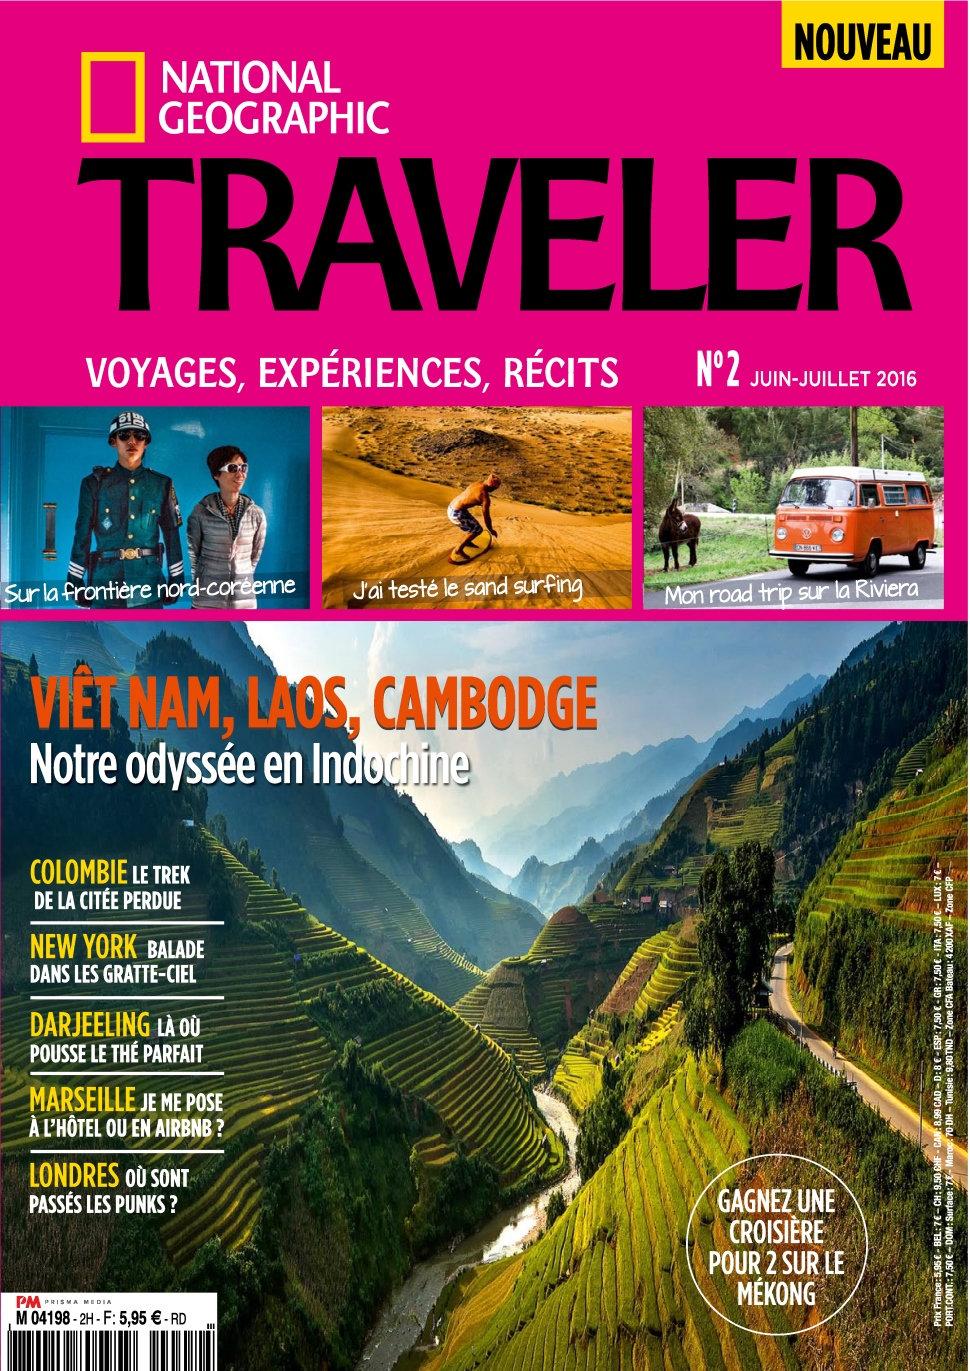 National Geographic Traveler N°2 - Juin/Juillet 2016